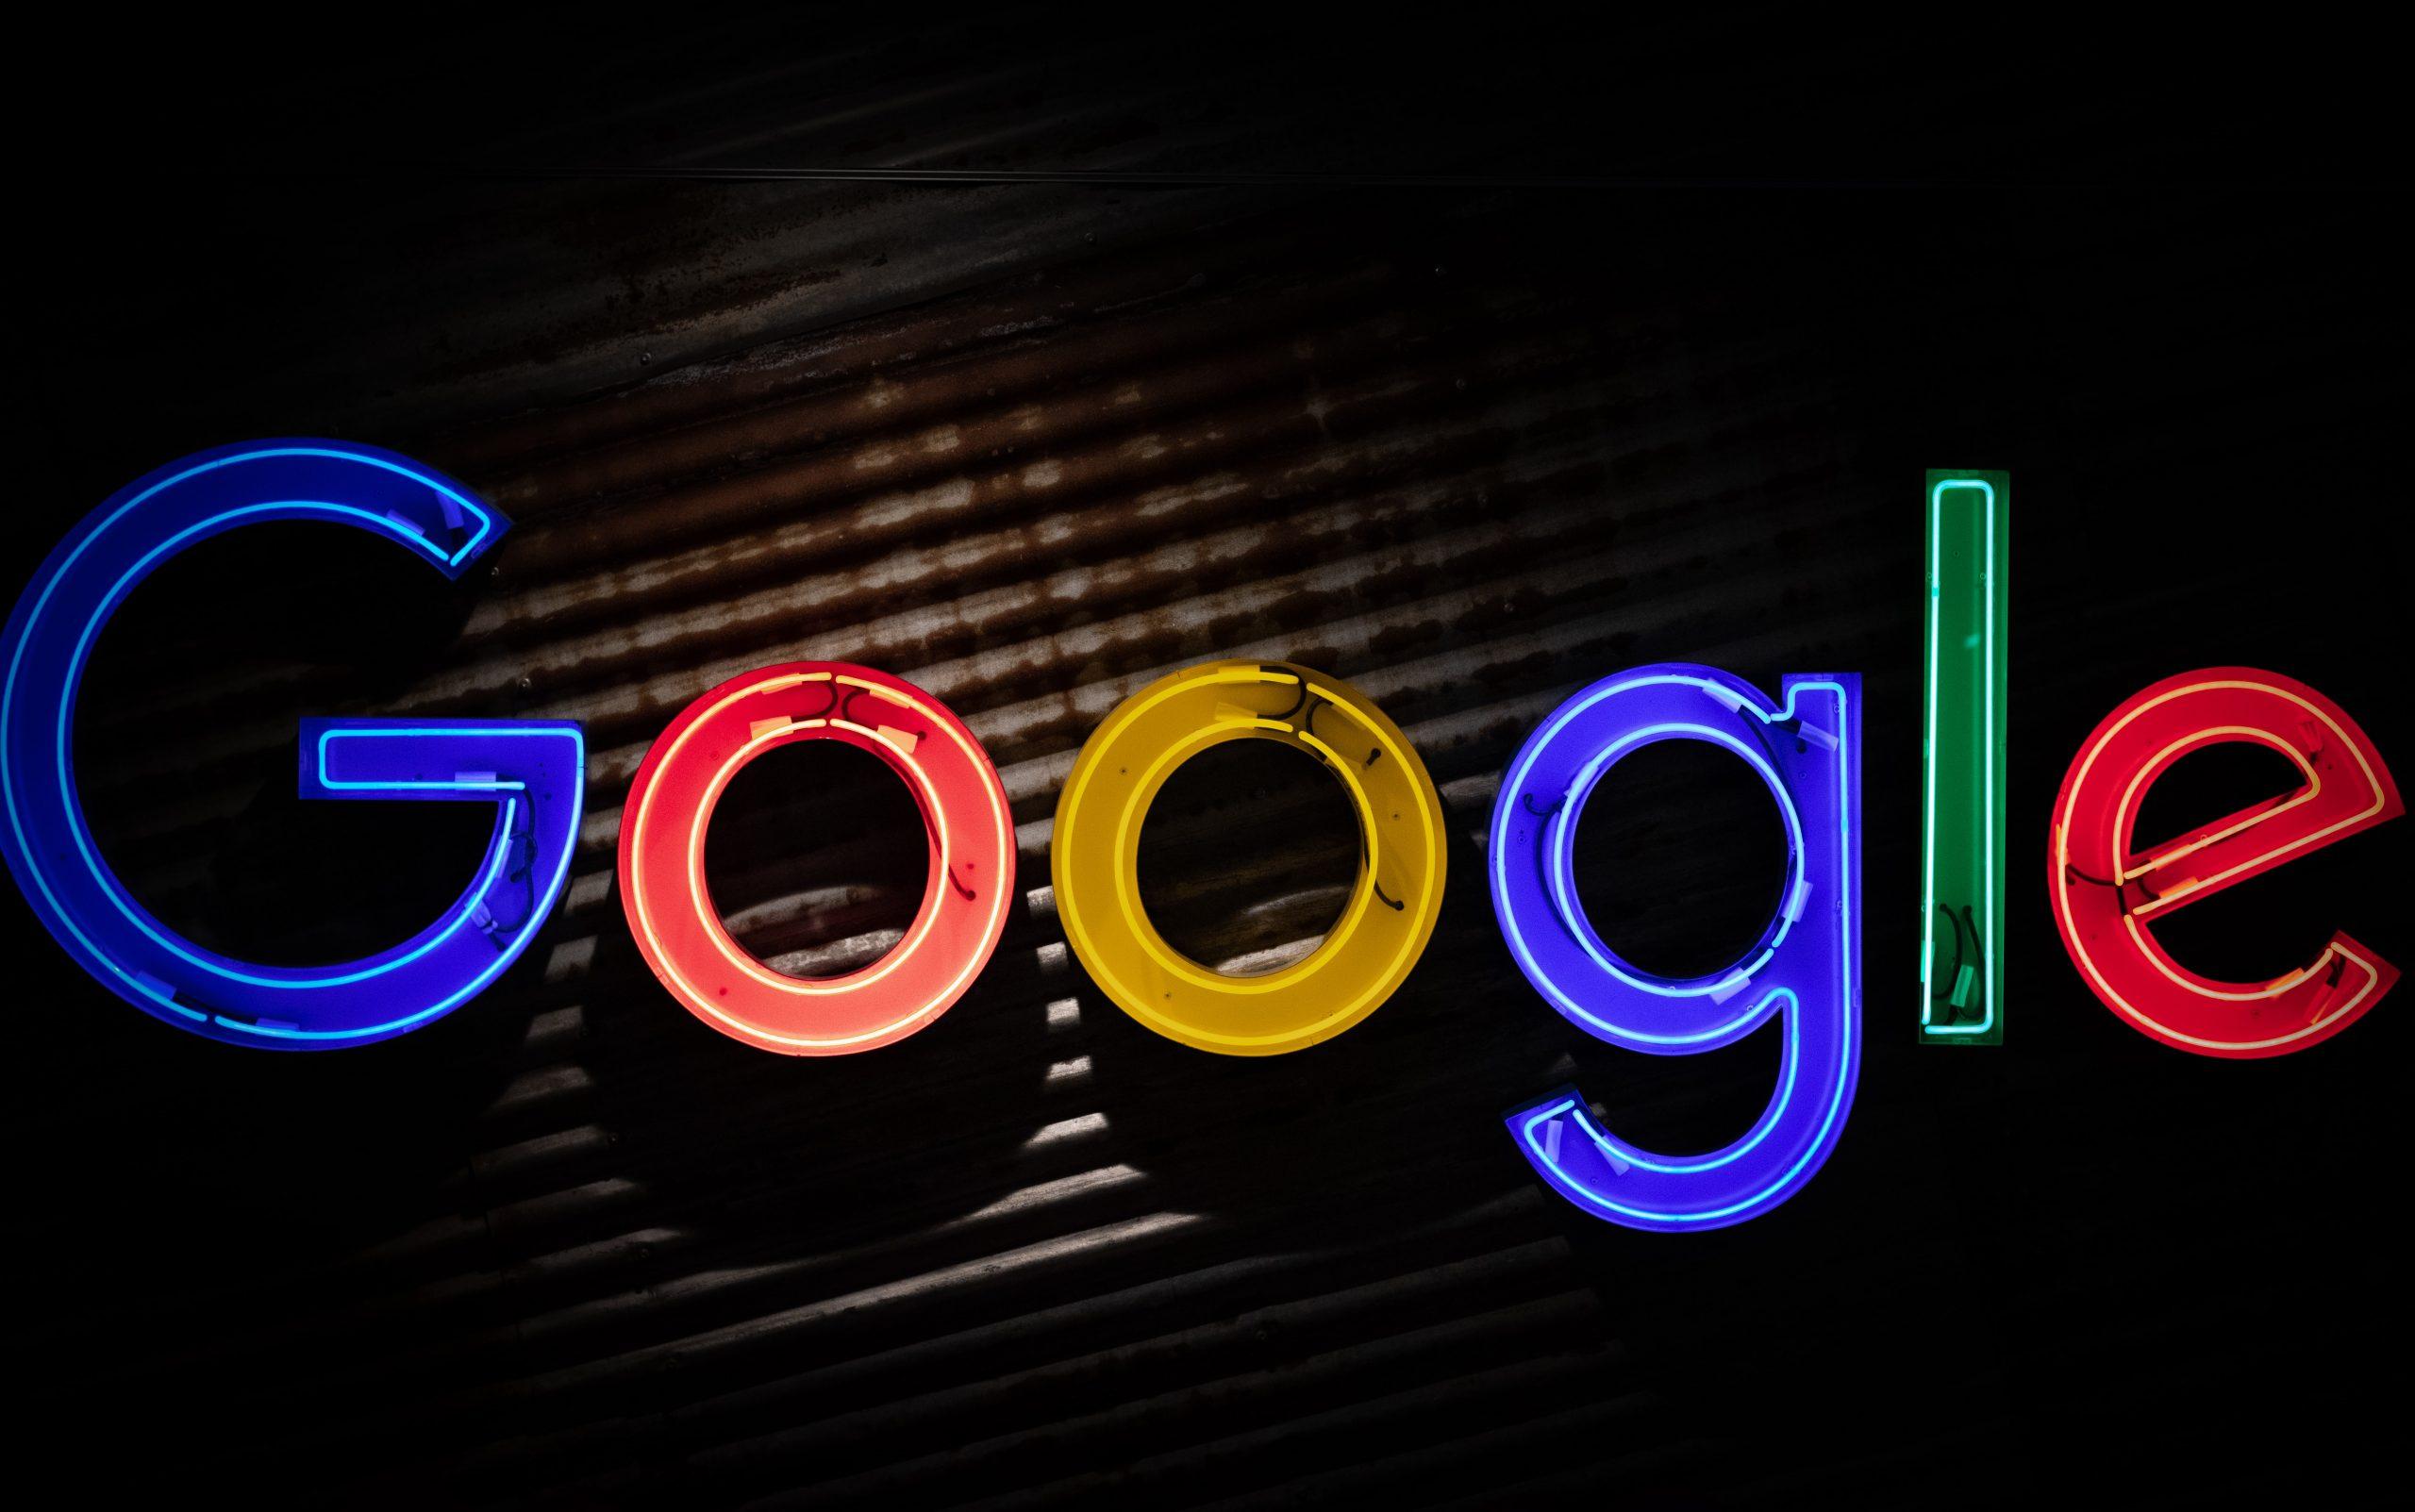 Google Neon Sign